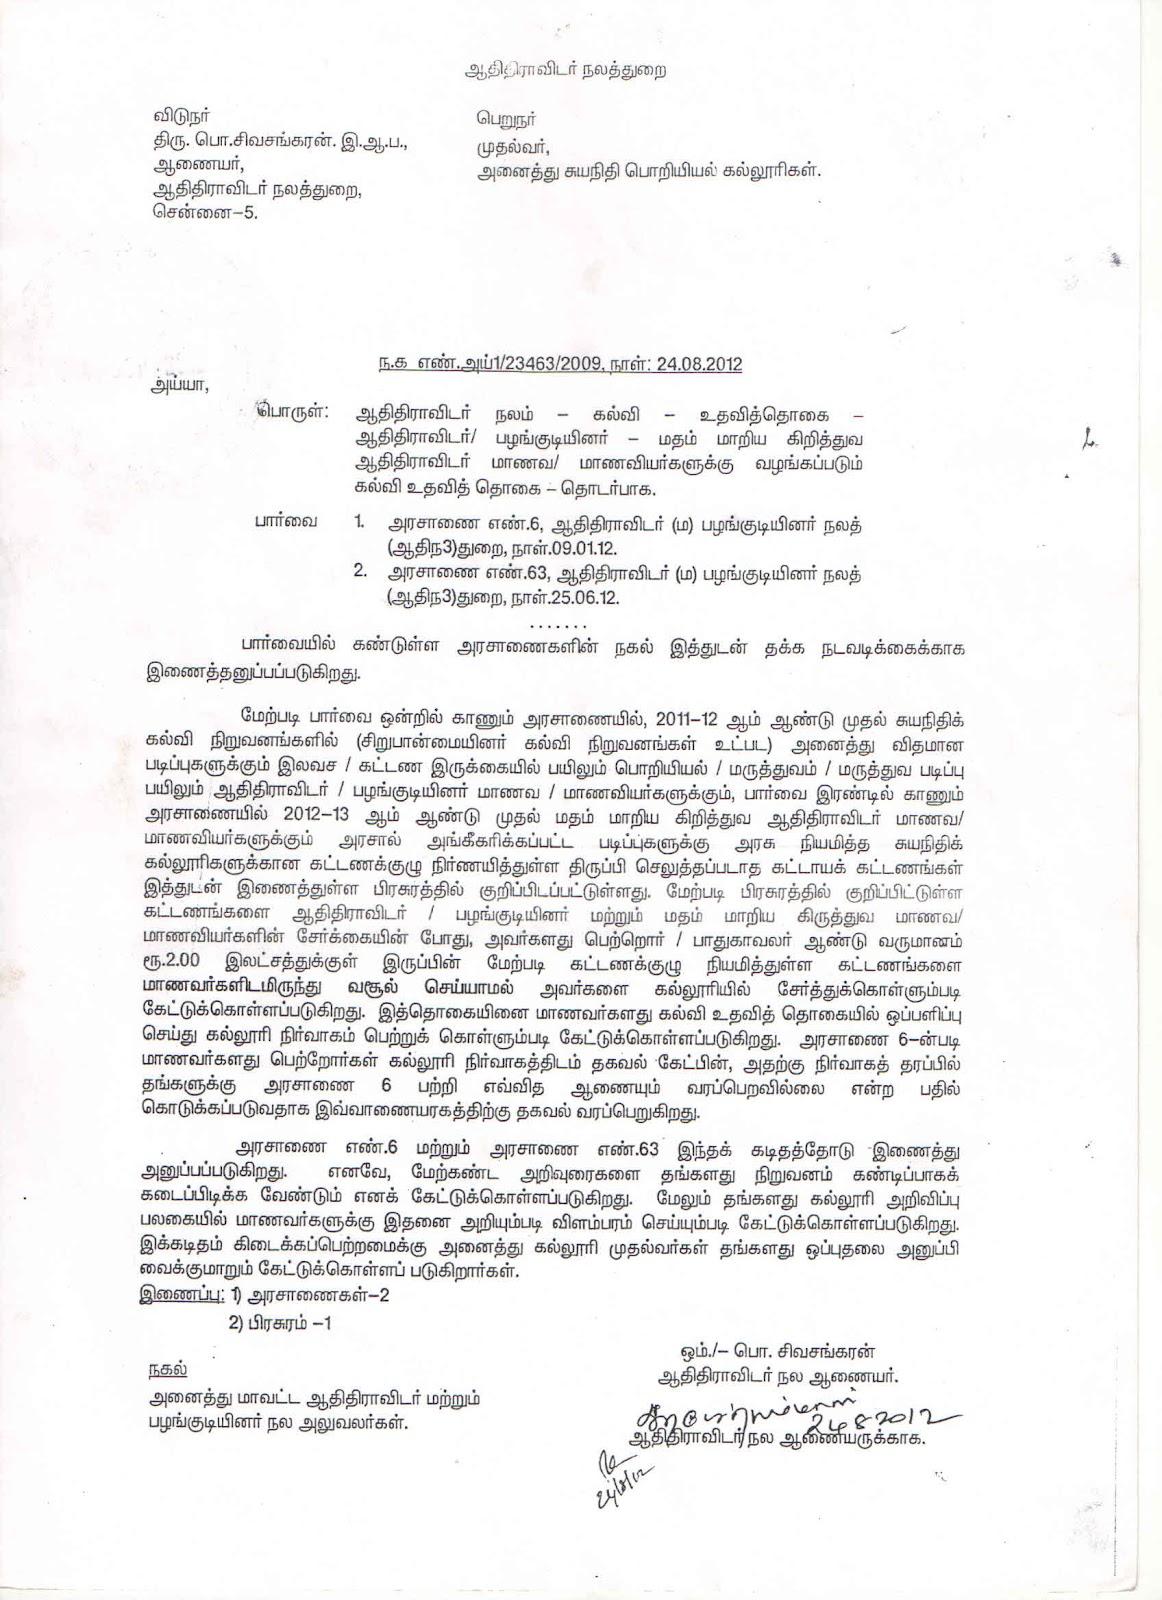 COMMUNIST STUDY CIRCLE: Tamil Nadu government Post-Matric